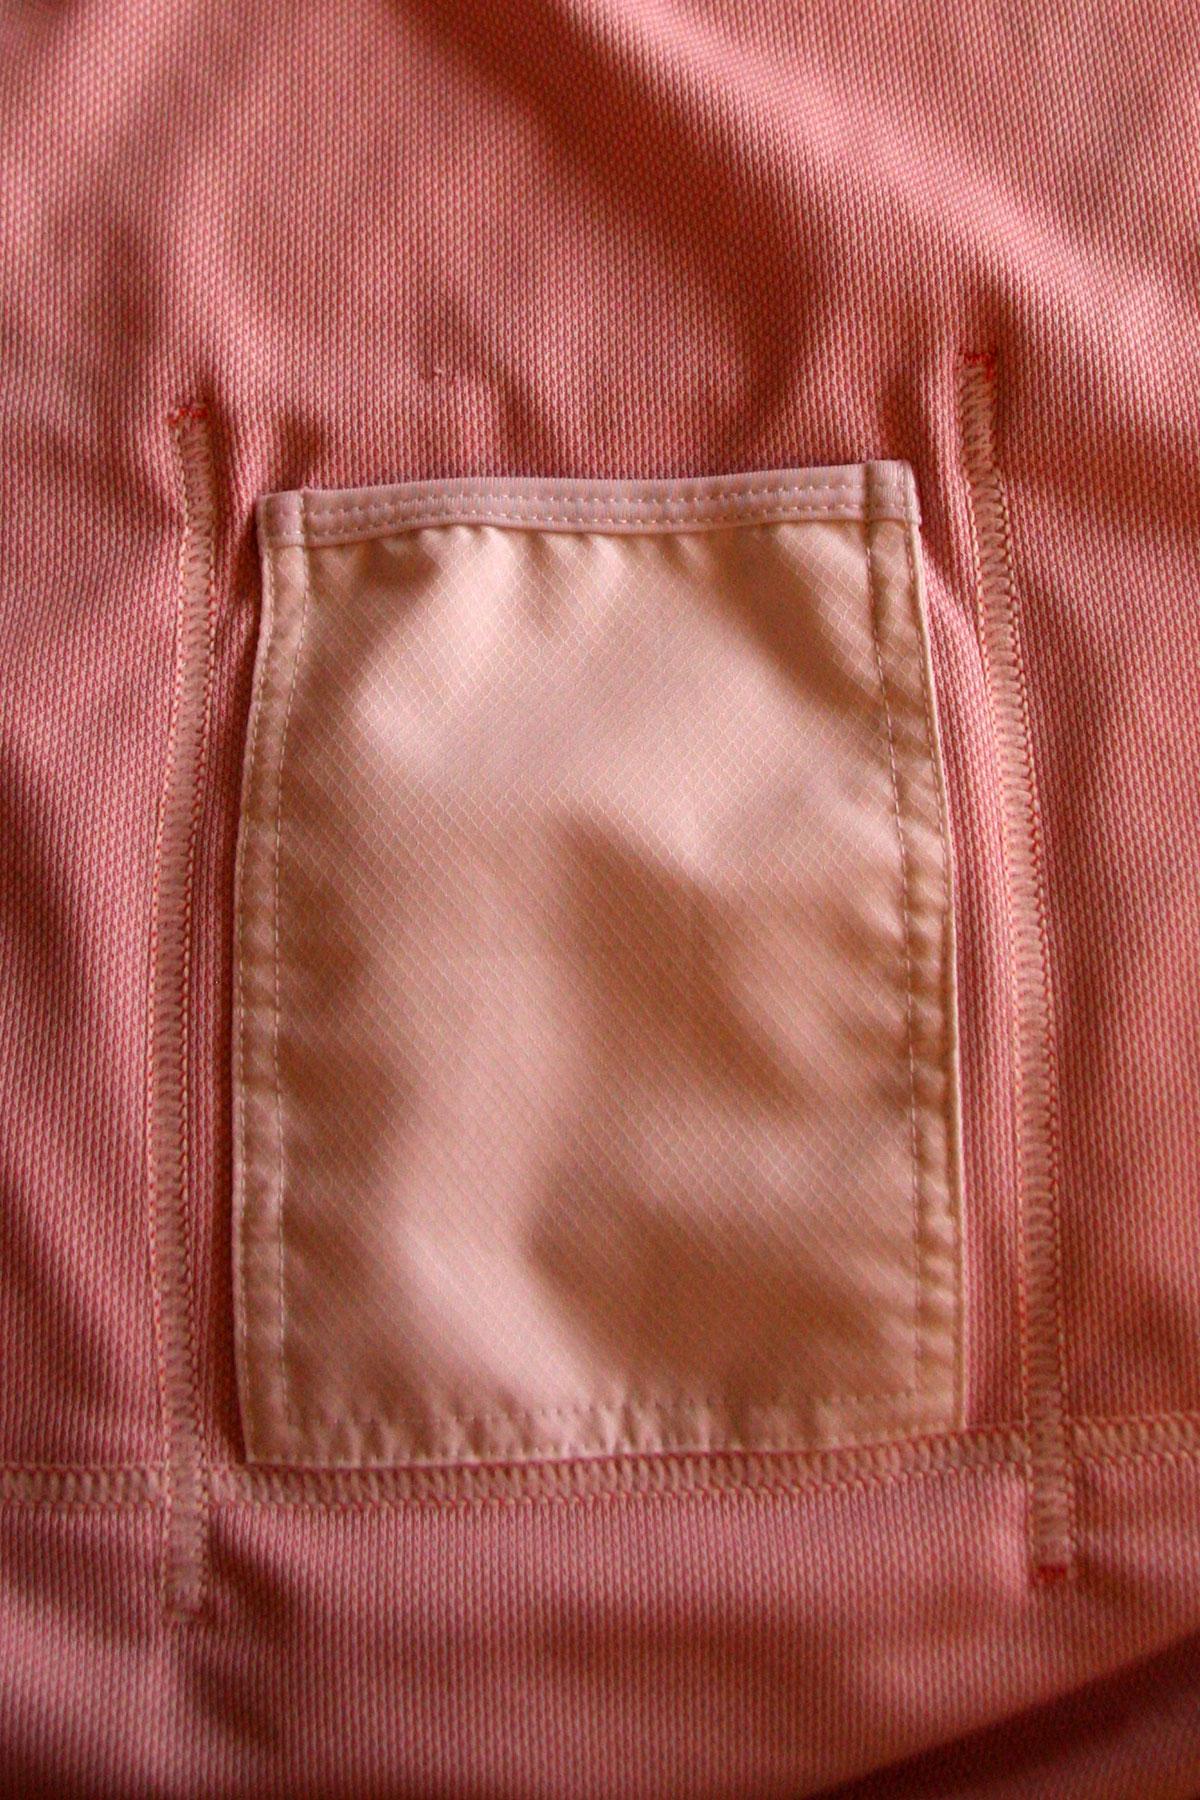 Sweat Proof Pocket